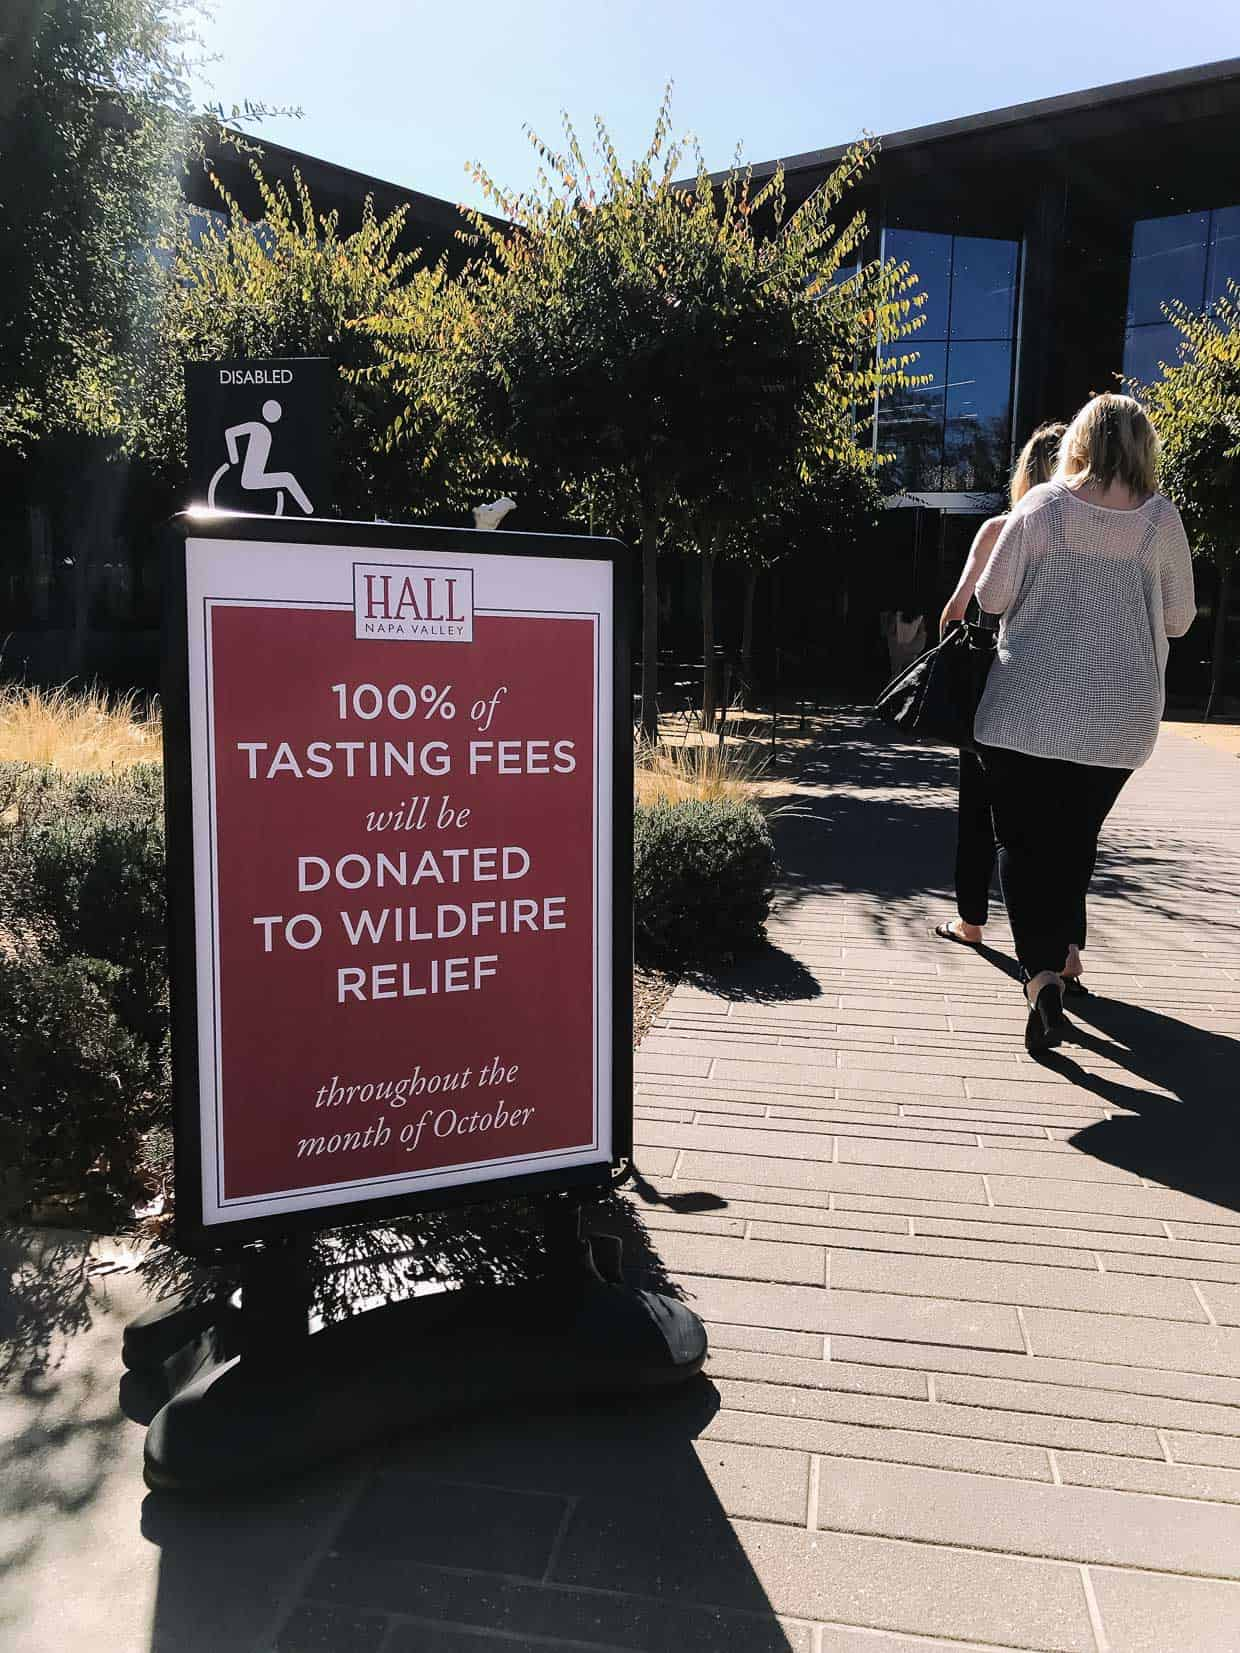 Wine Tasting at Hall Winery with Zephyr. #sponsored by Zephyr Ventilation. #ZephyrDesignTribe #ZephyrDesignerRetreat2017.